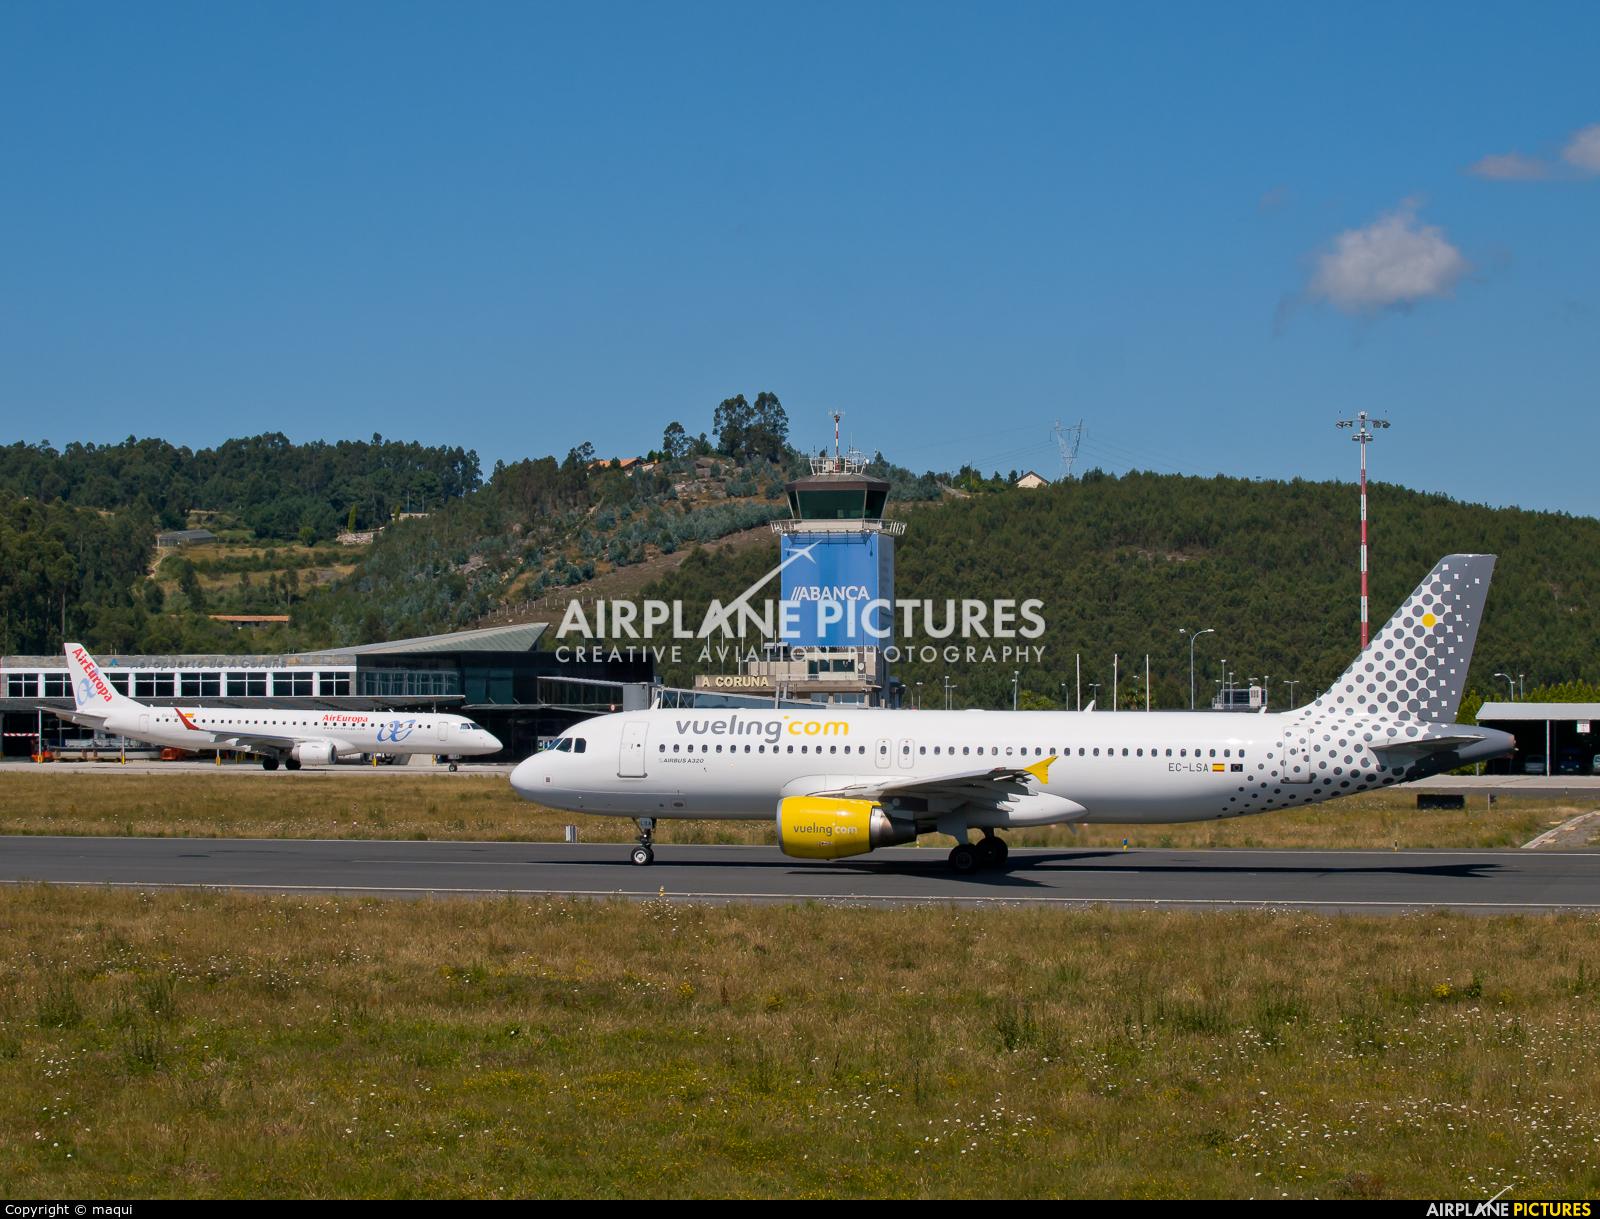 Vueling Airlines EC-LSA aircraft at La Coruña